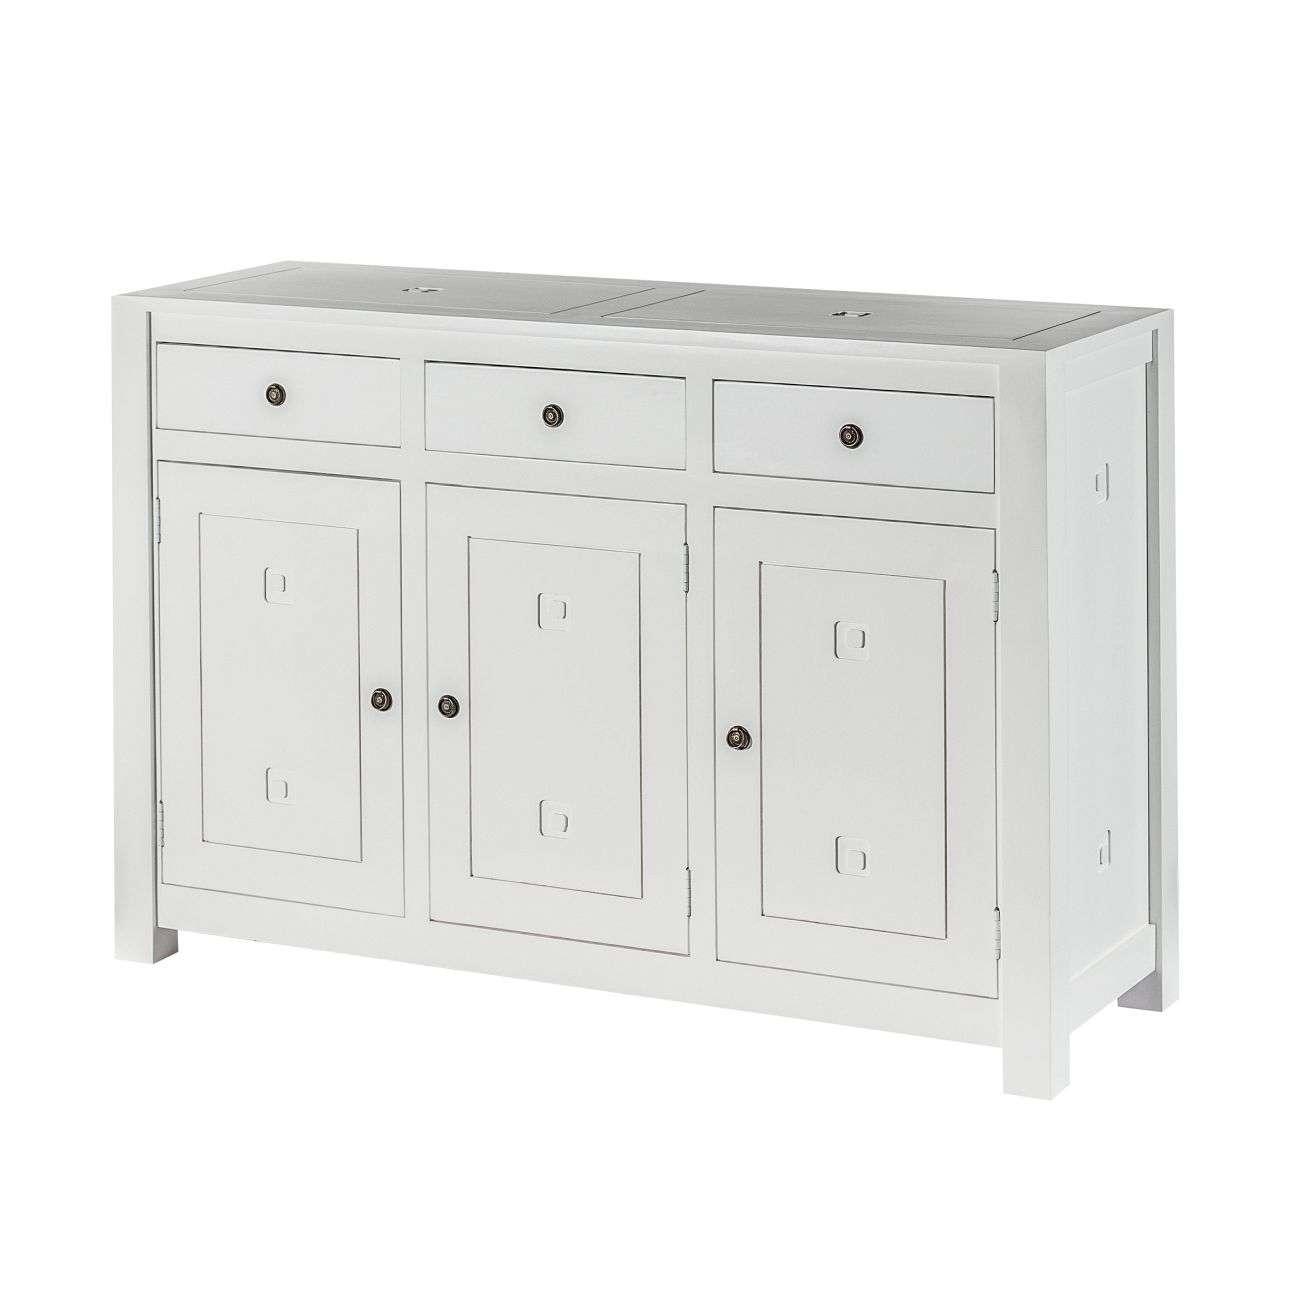 Dressoir Noa white 150x50x100cm